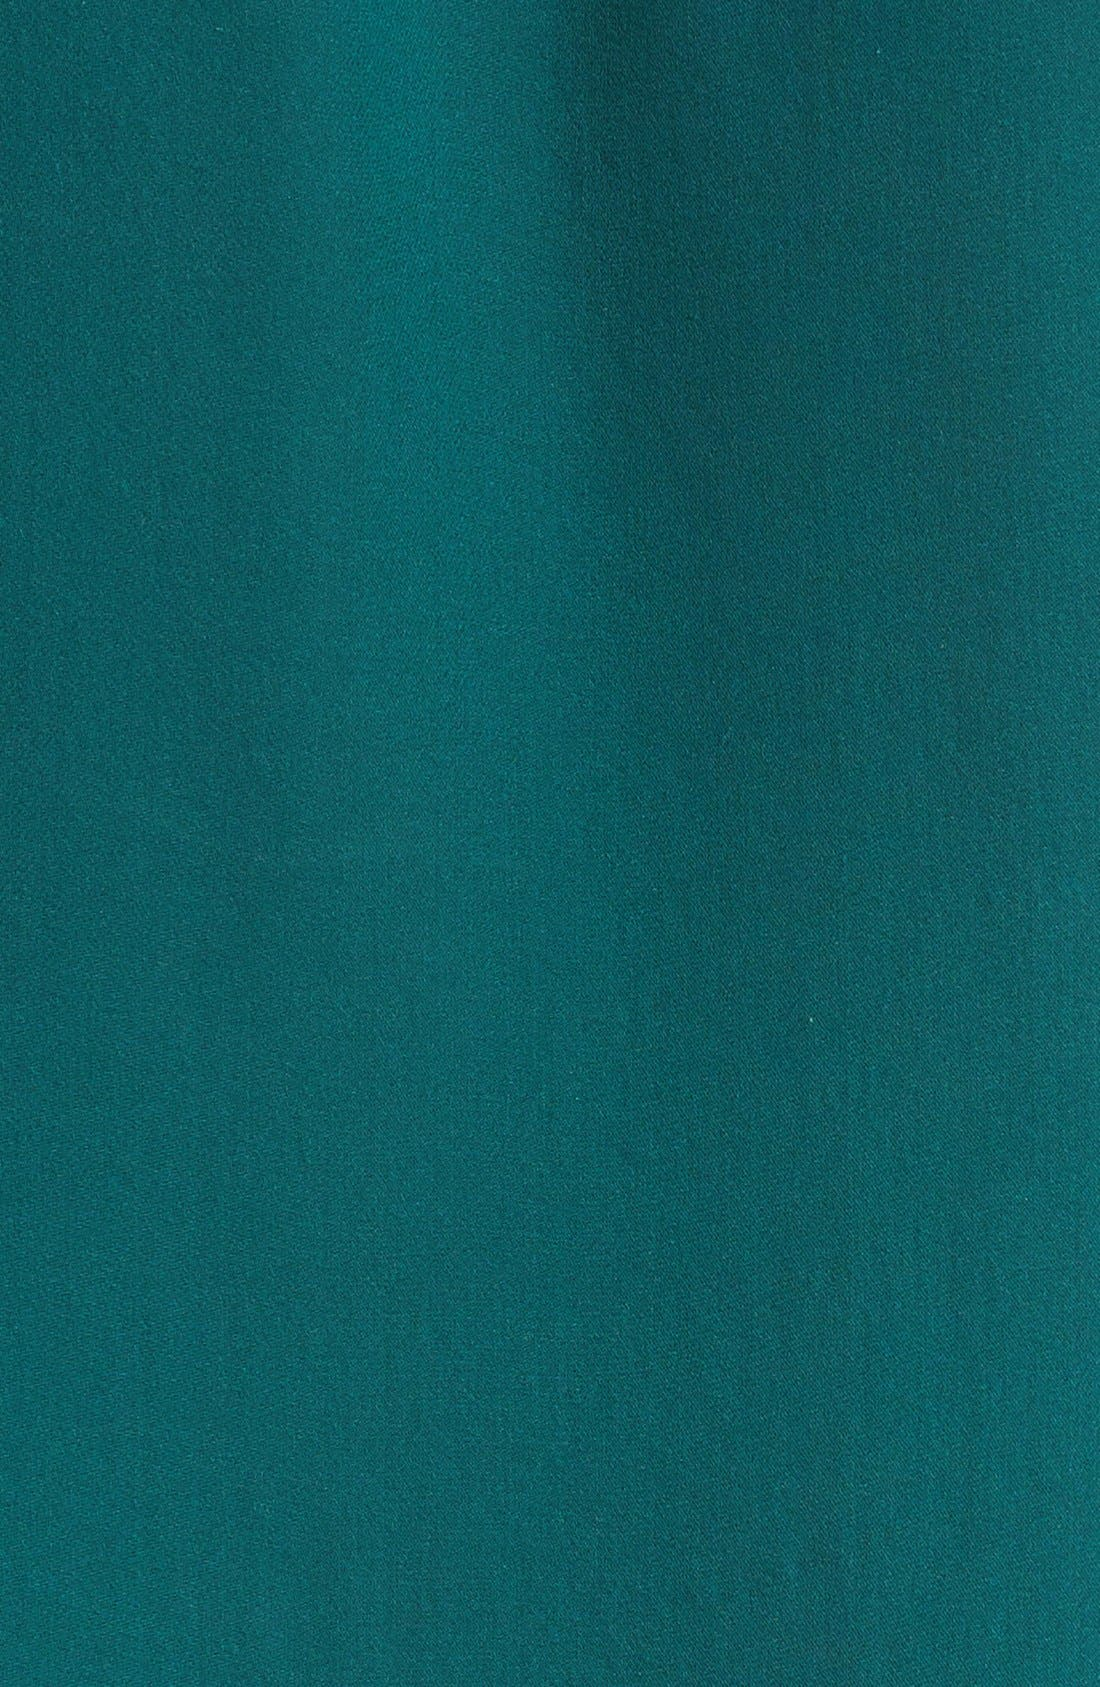 Alternate Image 3  - Joie 'Etienne' Silk Top